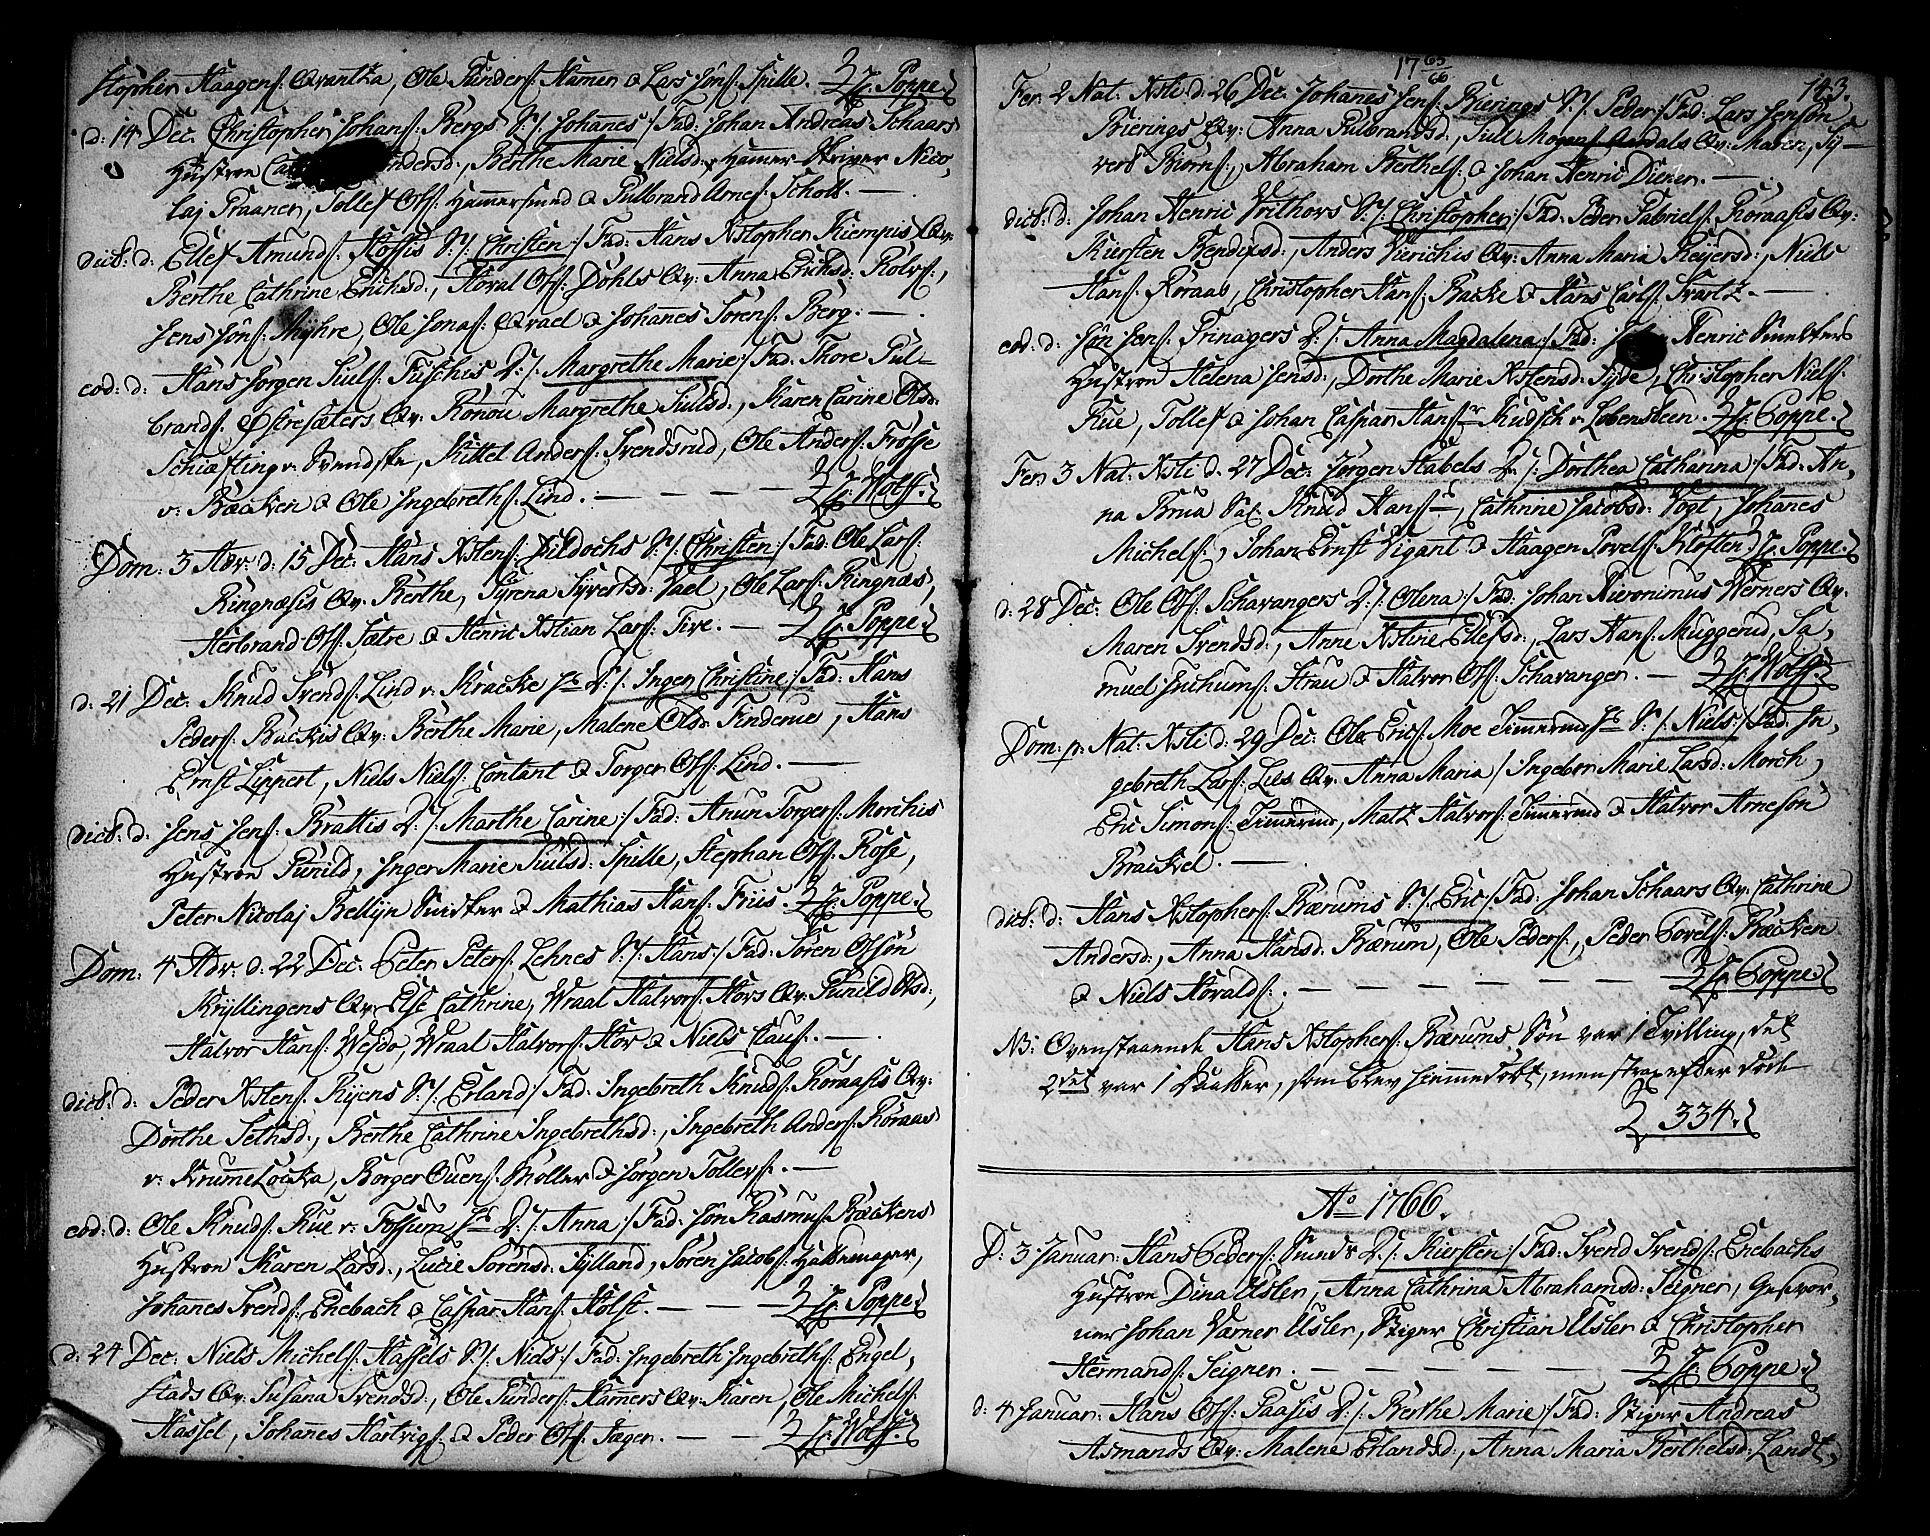 SAKO, Kongsberg kirkebøker, F/Fa/L0004: Parish register (official) no. I 4, 1756-1768, p. 143